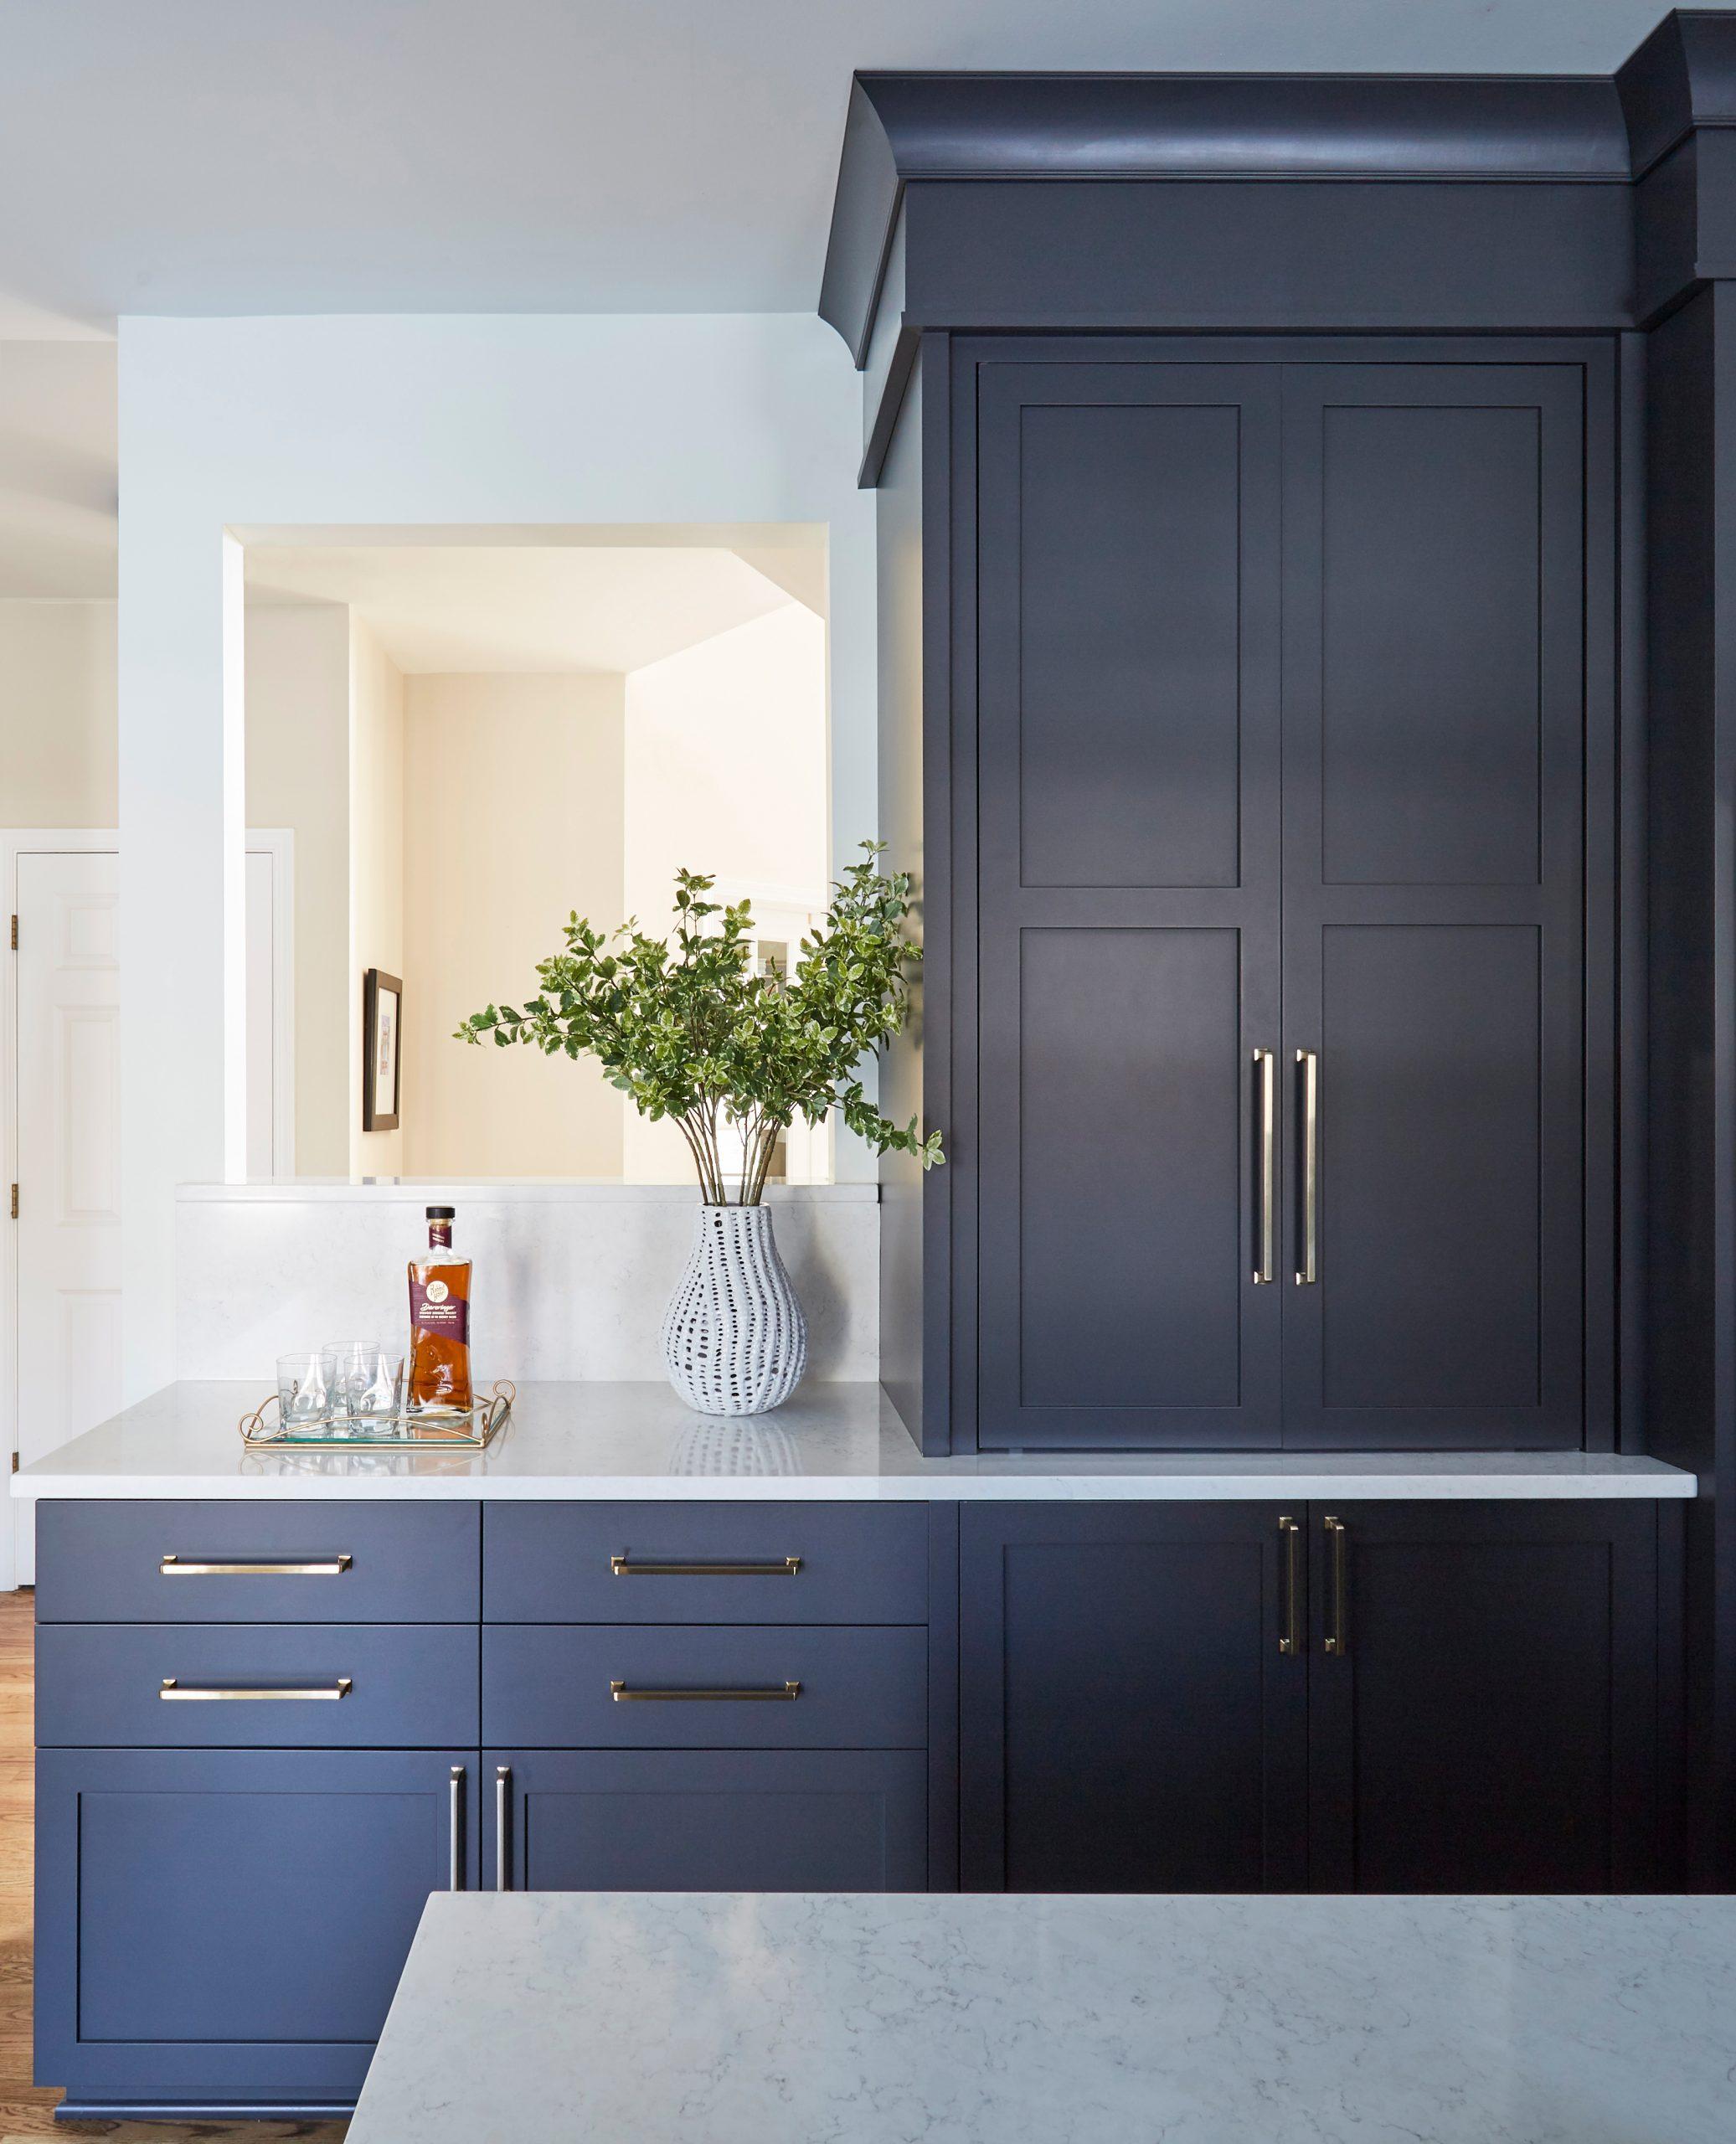 Thornwood Kitchen cabinets St Charle, IL